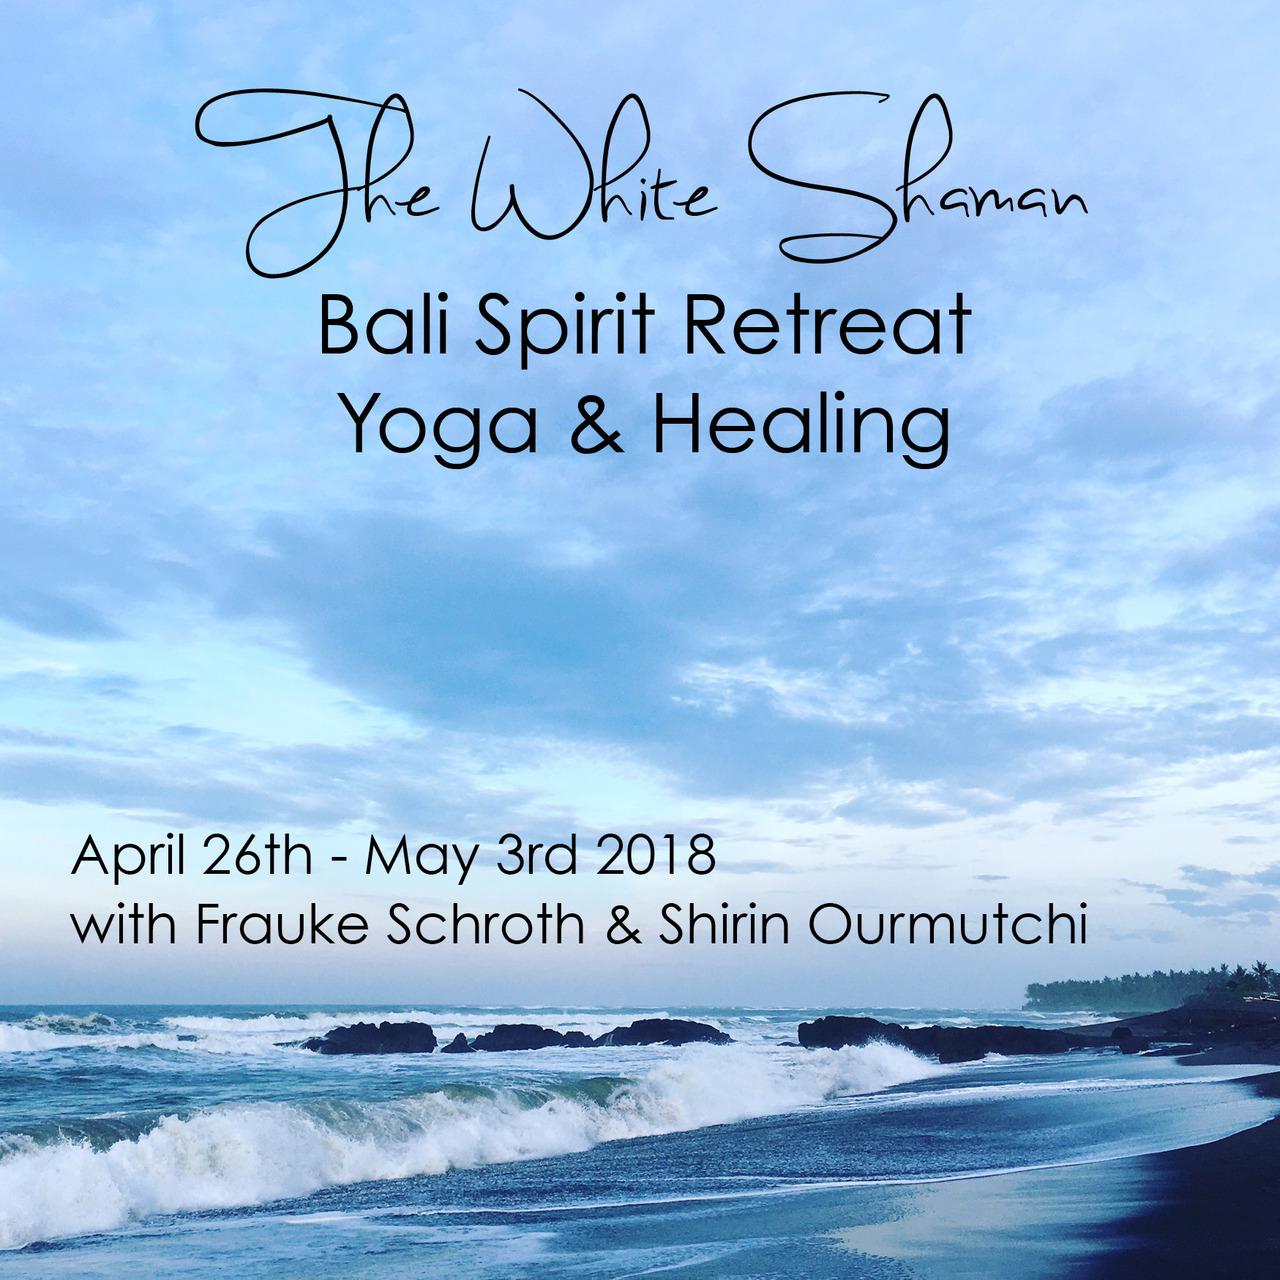 the white shaman bali spirit retreat yoga healing event retreat guru. Black Bedroom Furniture Sets. Home Design Ideas